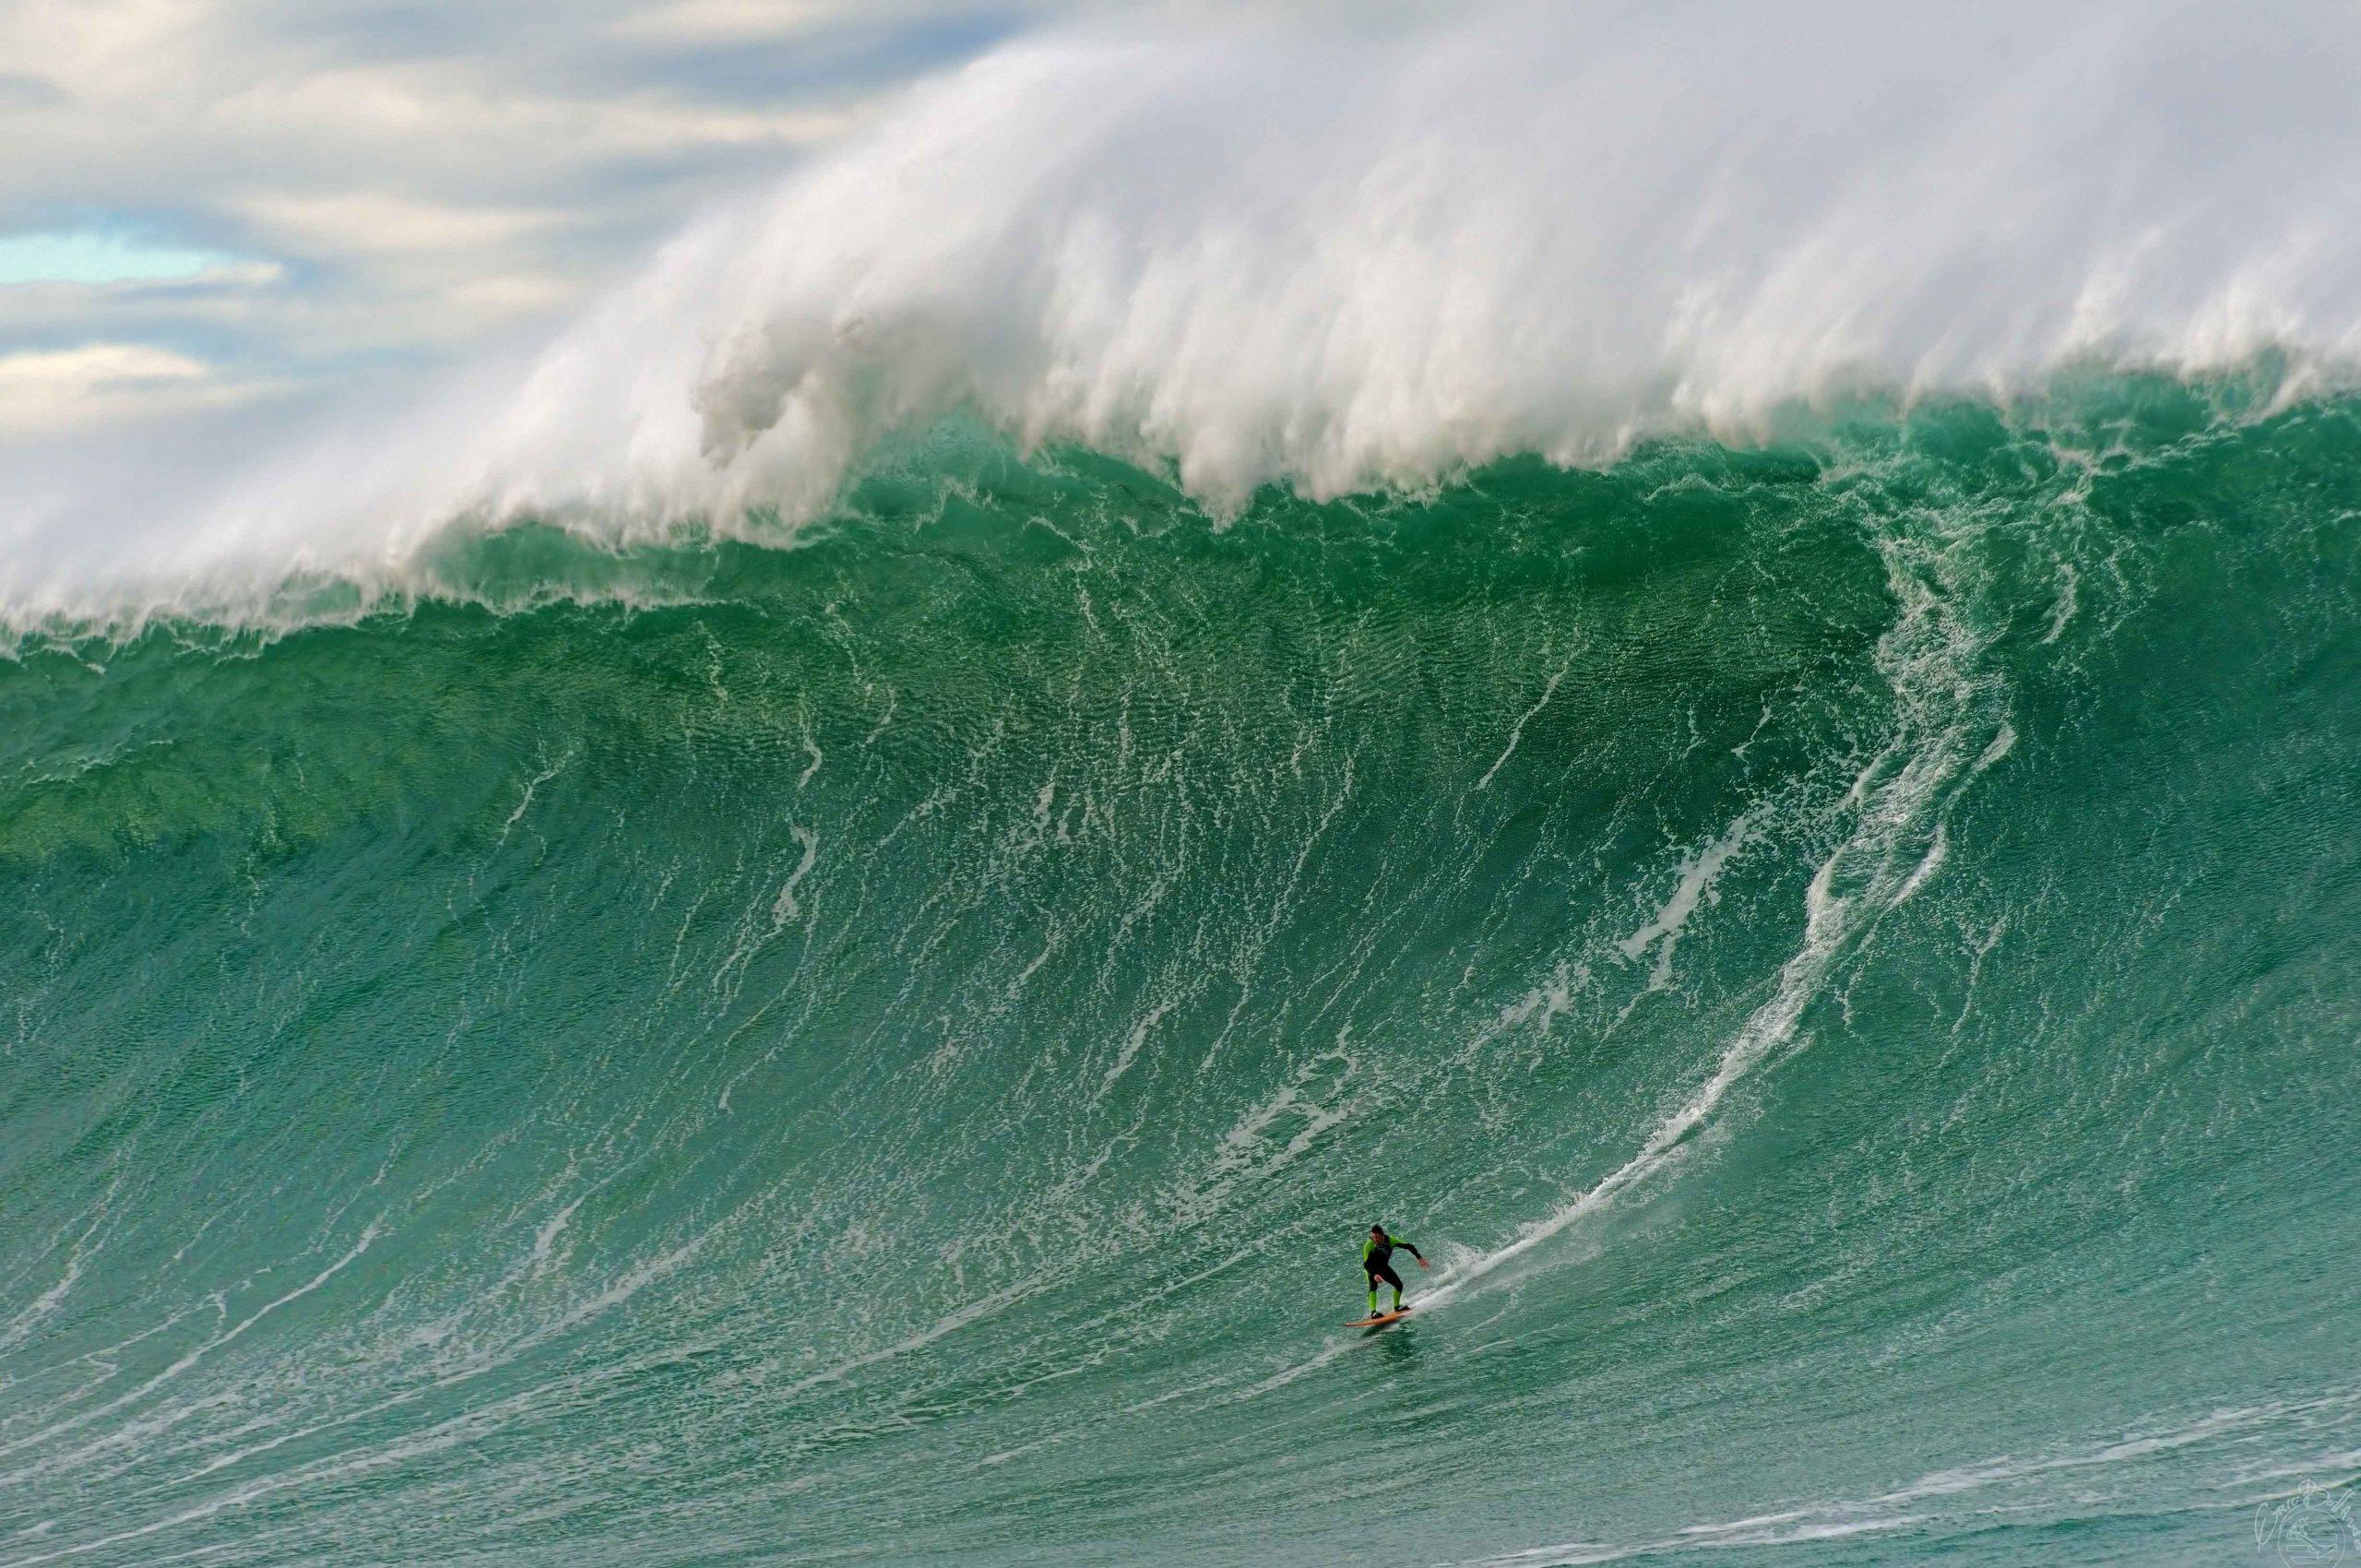 Vertigo Inhibits Me From Surfing, So I Photograph It: Gold